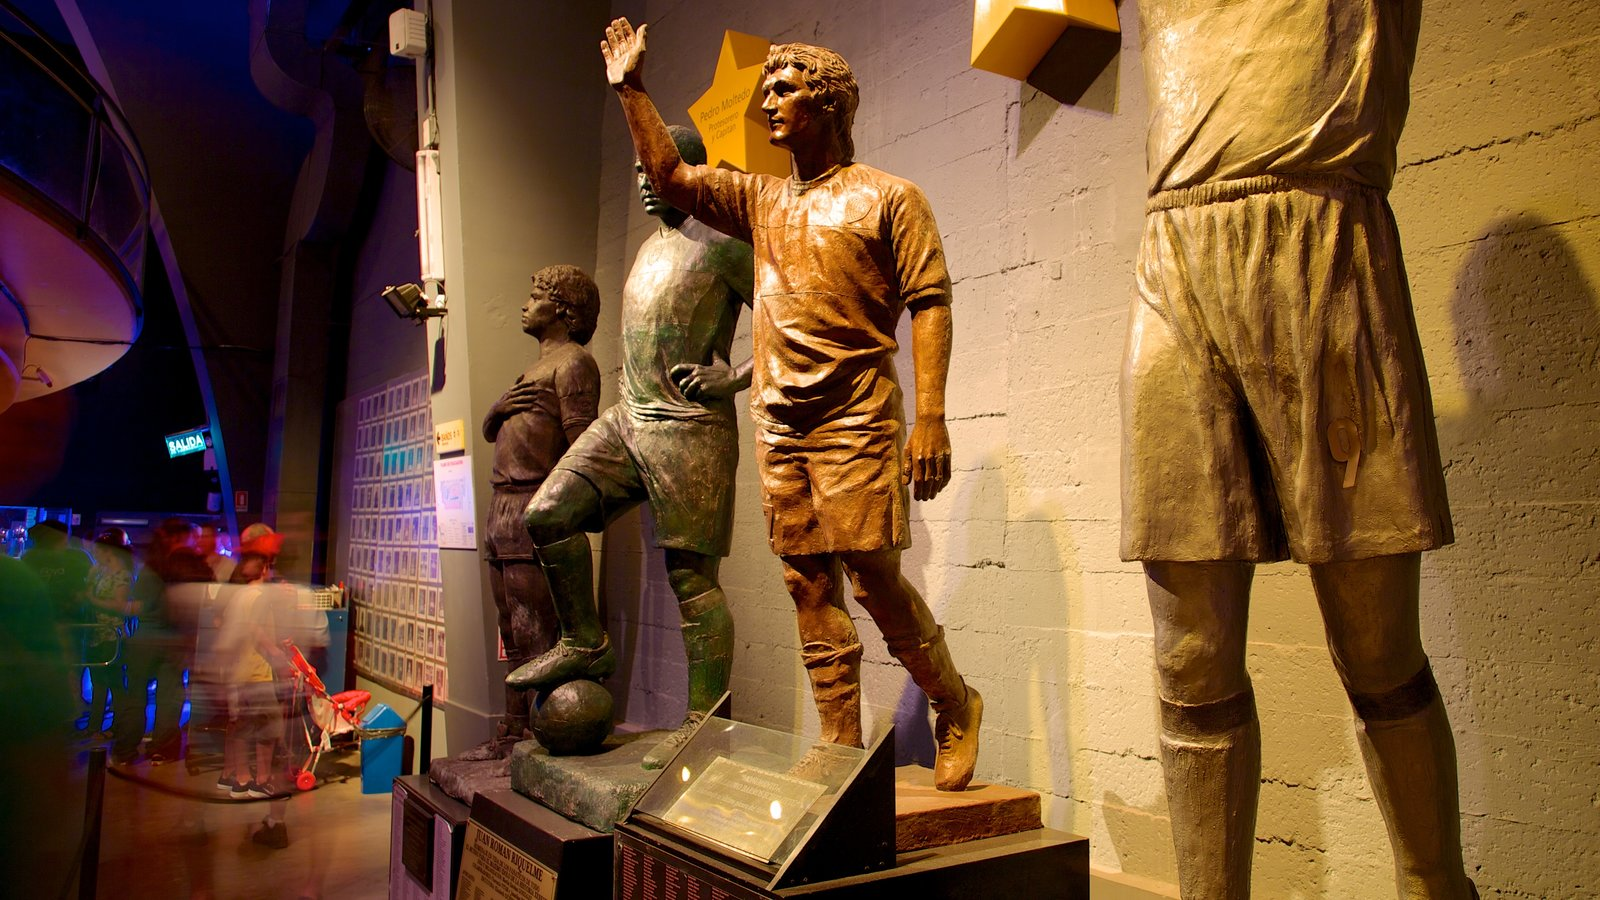 La Bombonera caracterizando vistas internas e uma estátua ou escultura